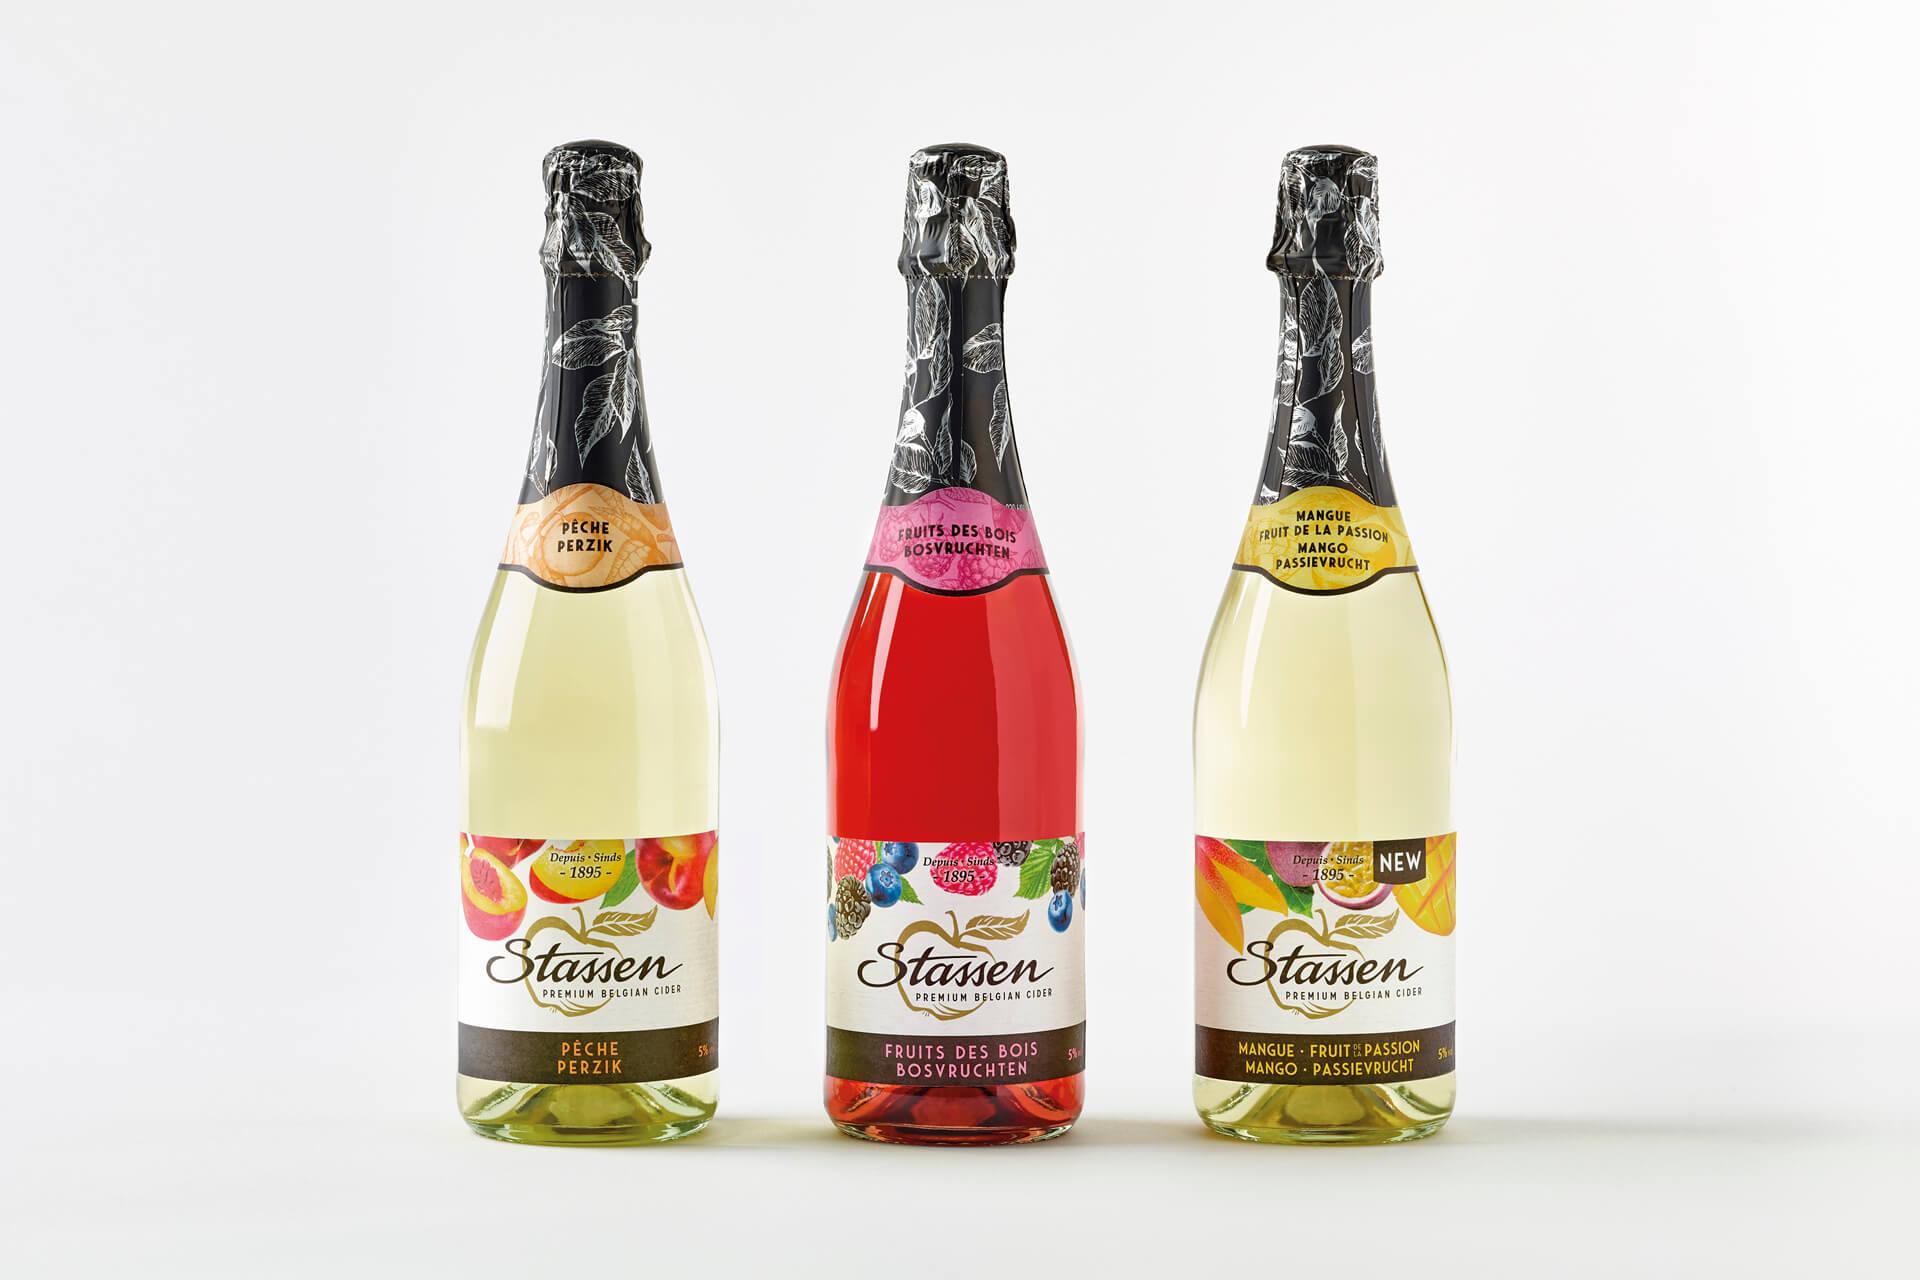 Fresh design by DesignRepublic for Stassen - Stassen Fruit Cider Packaging